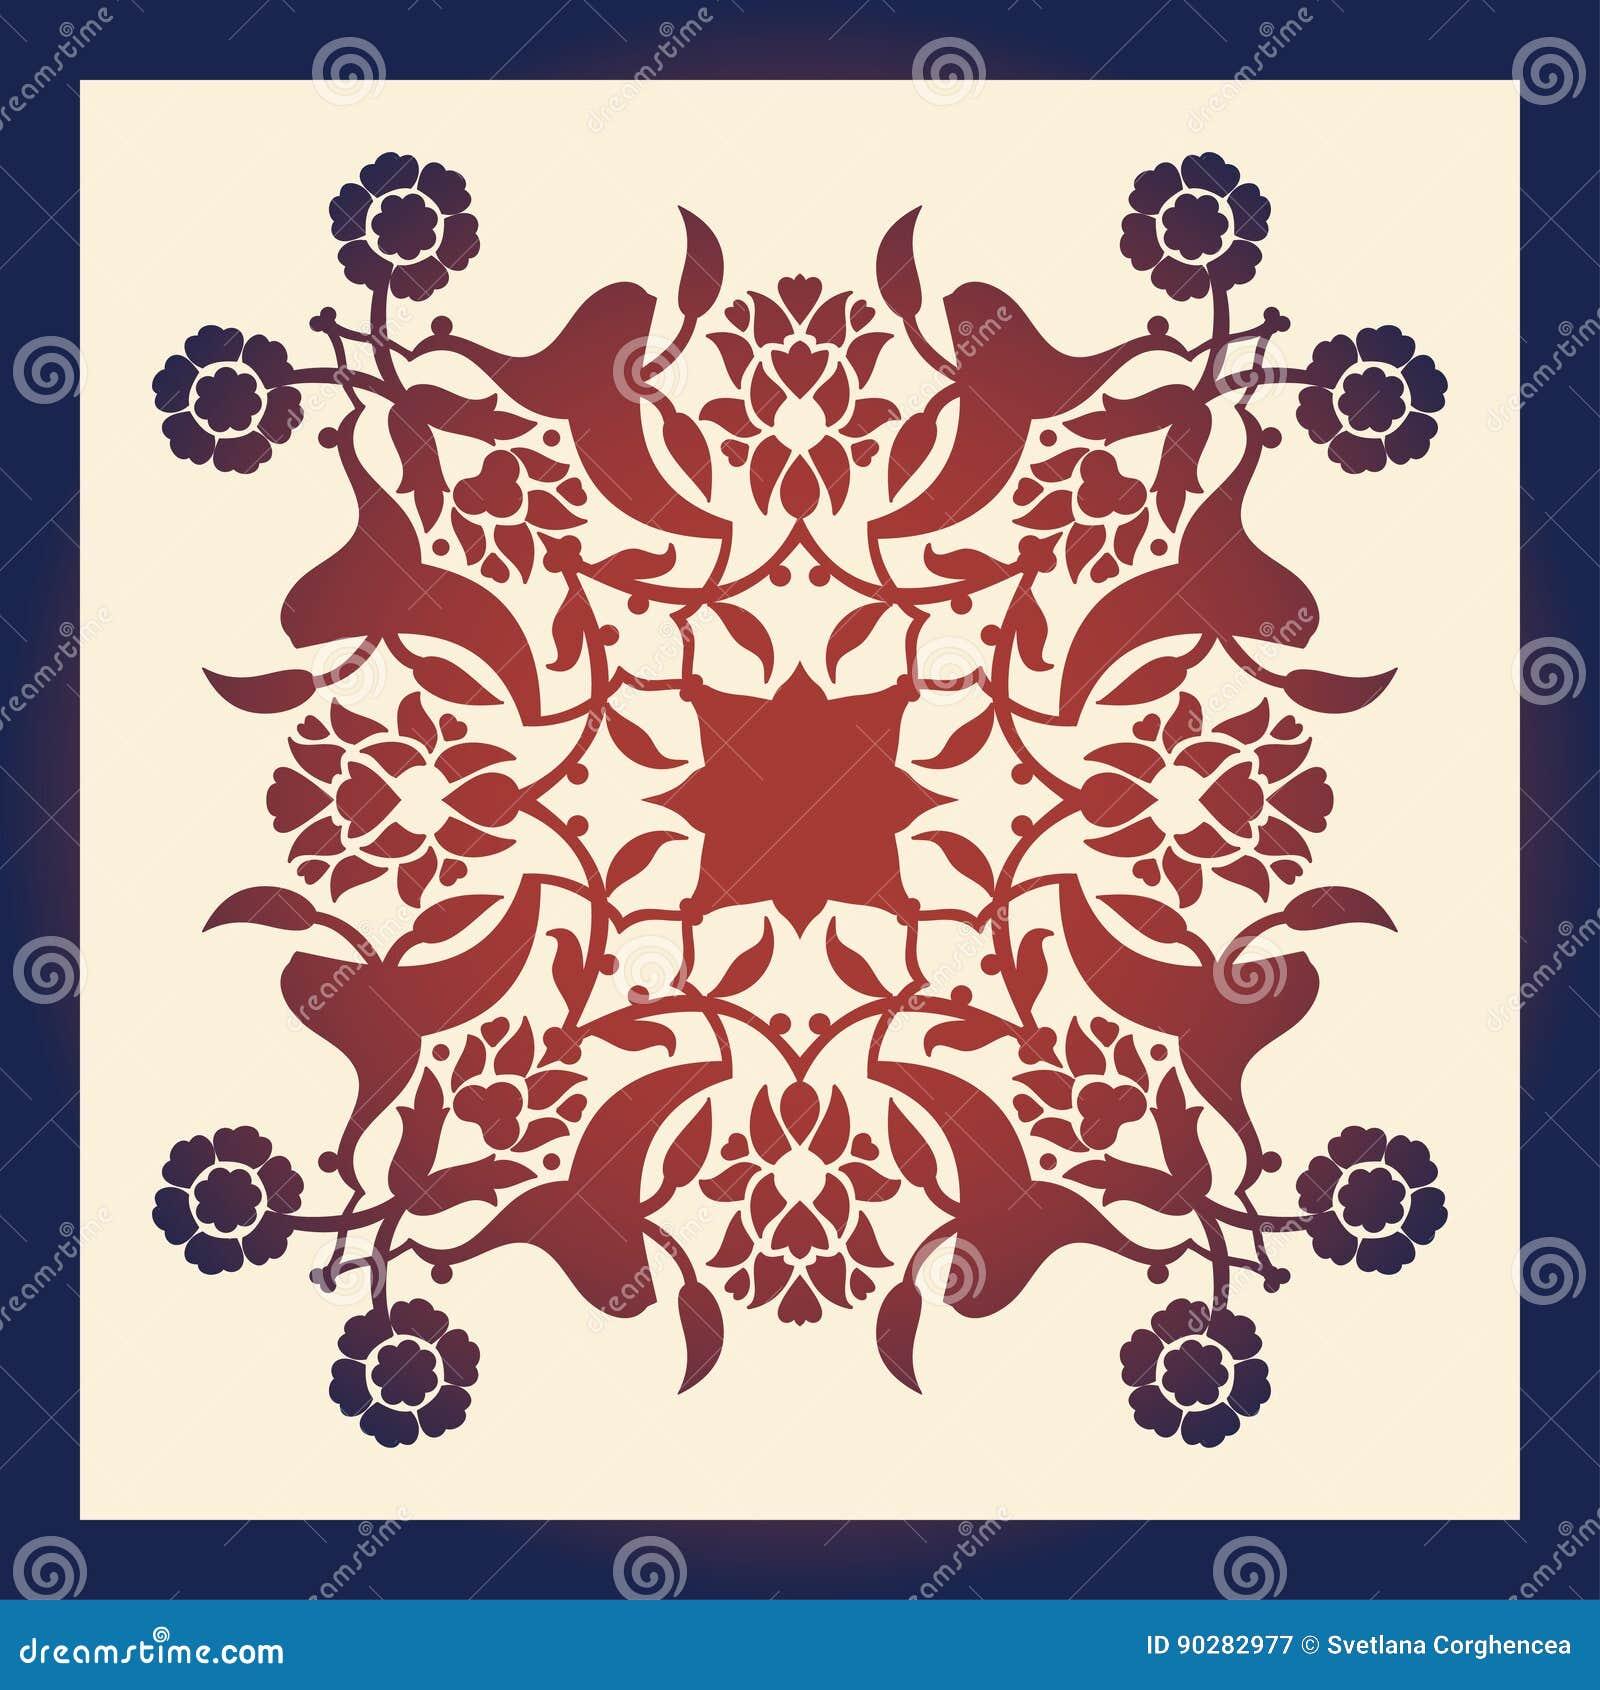 Laser Cut Floral Arabesque Ornament Pattern Vector. Template Cut ...